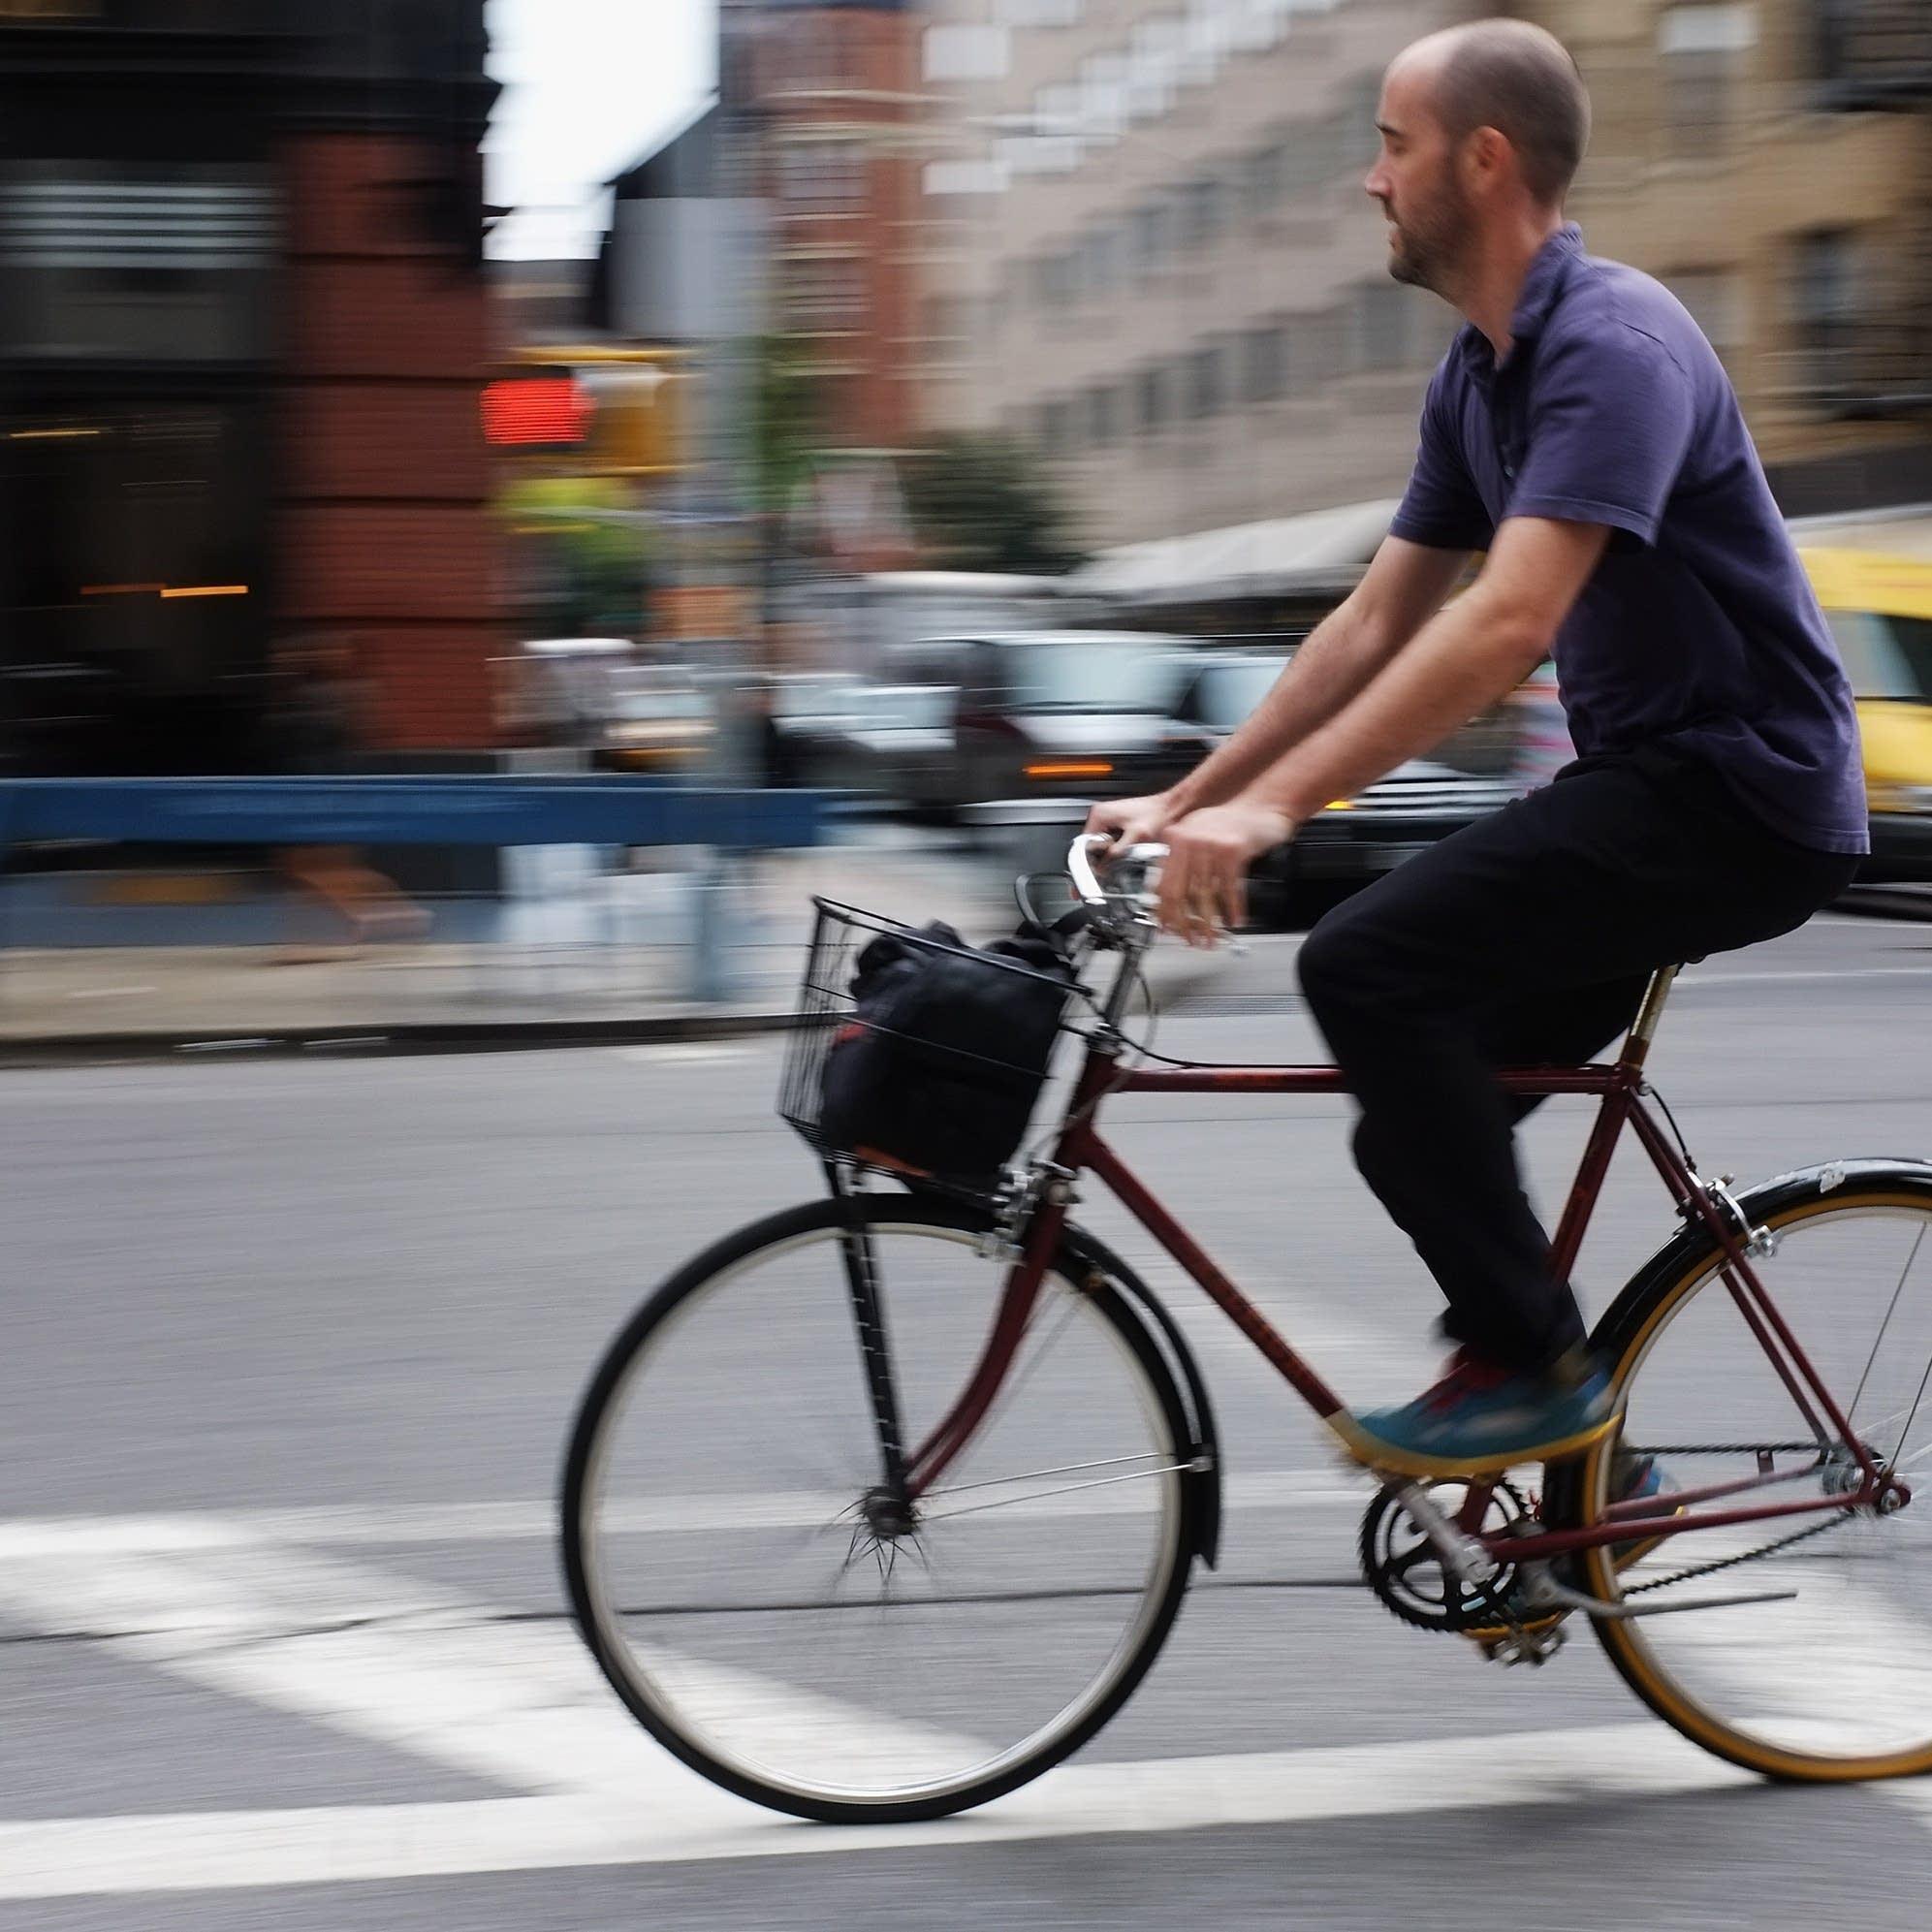 A man rides a bicycle along a Manhattan street.